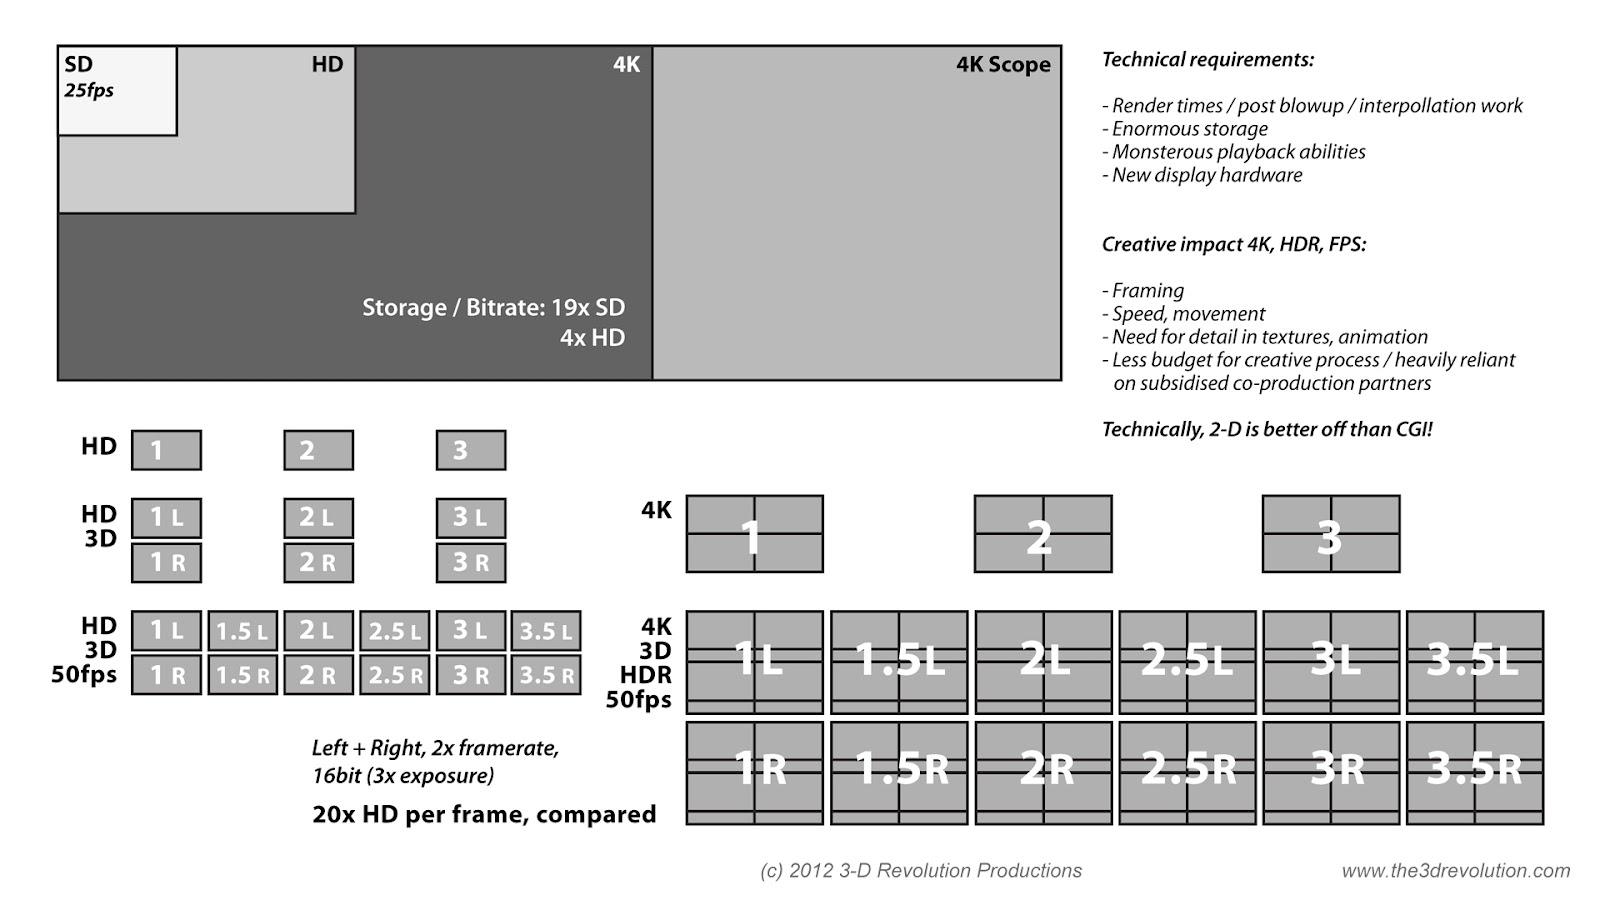 how to change aspect ratio on philips tv